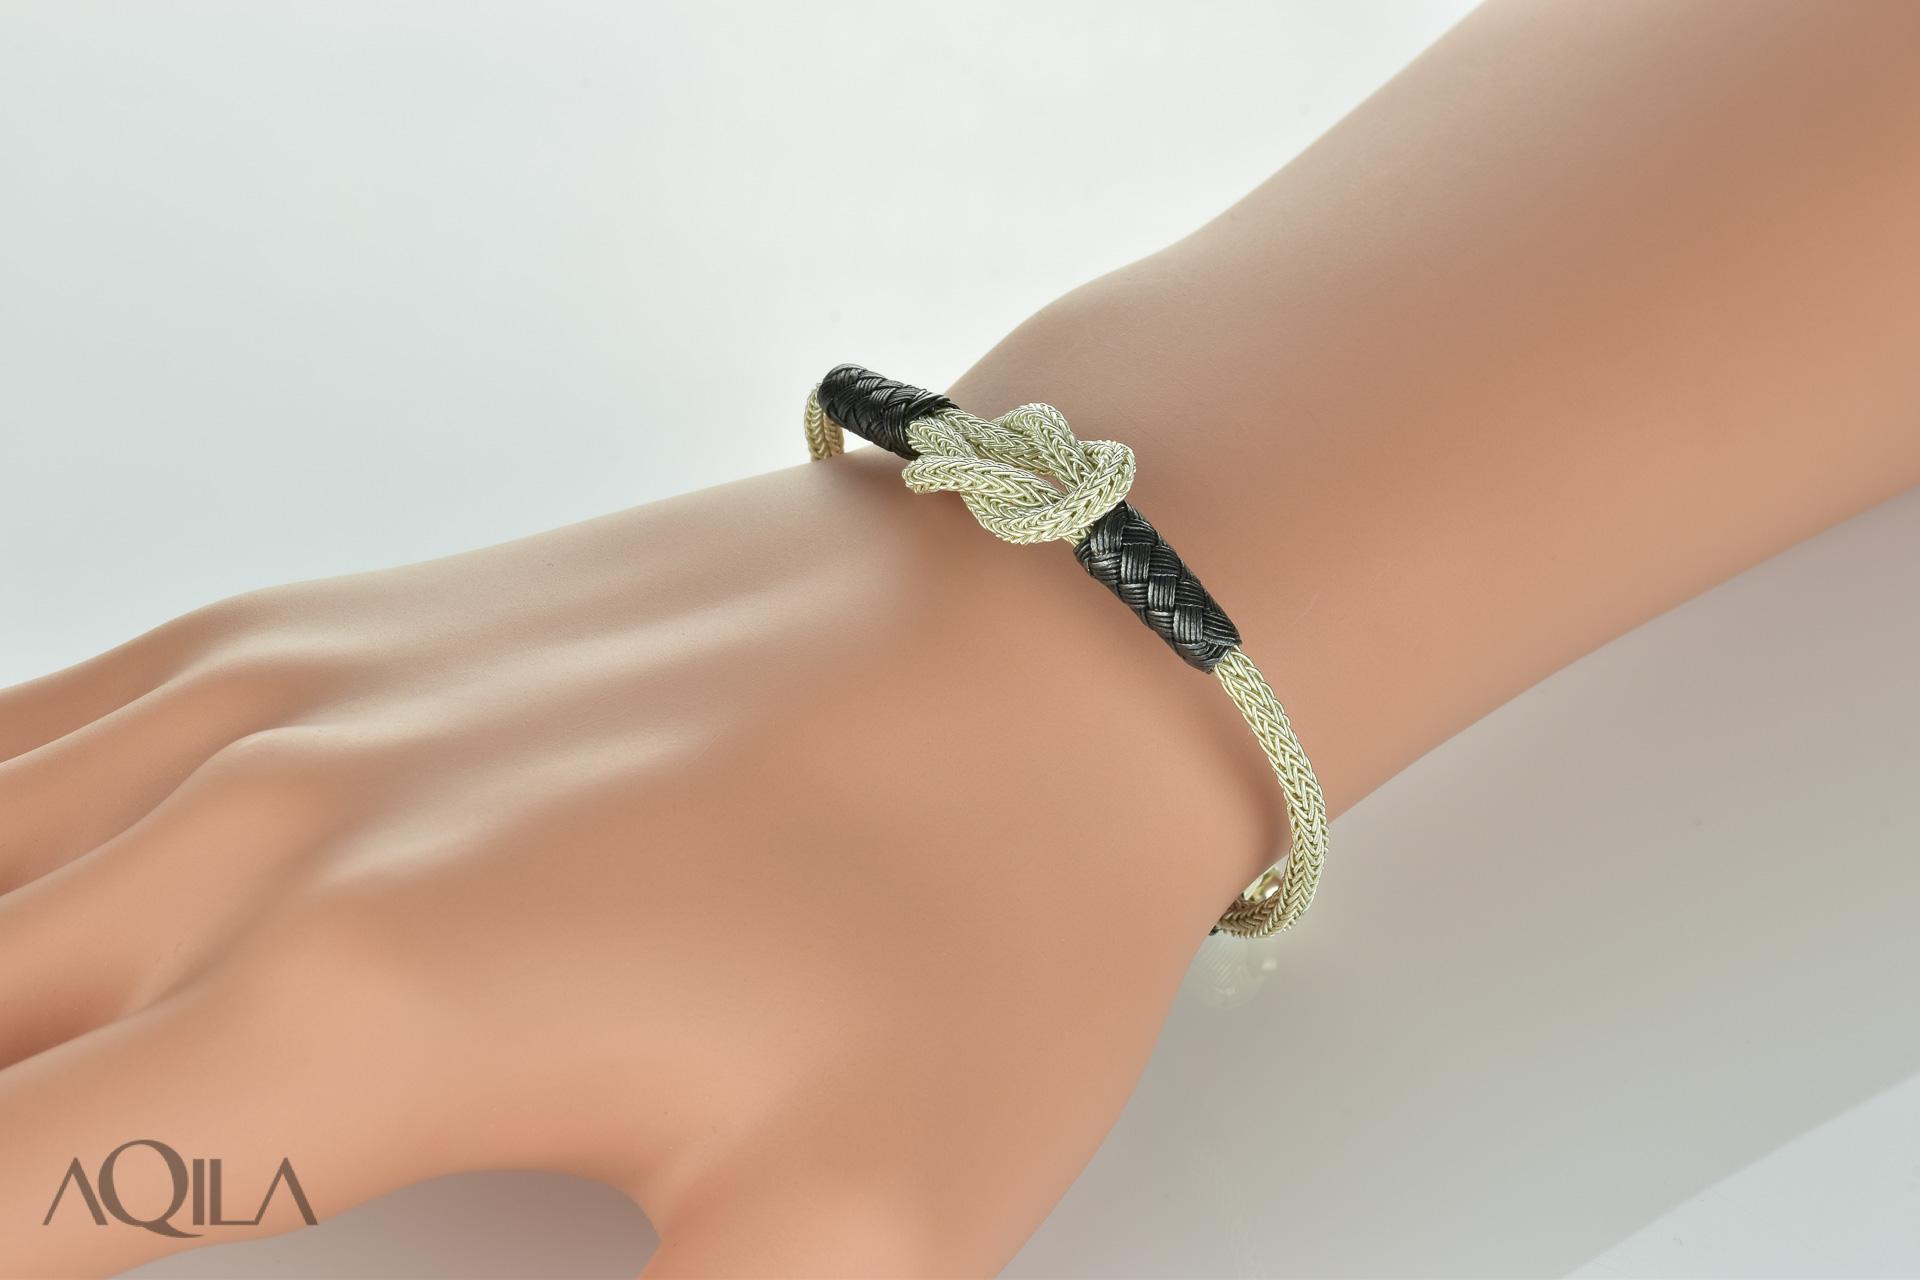 999 Silber Kordel Armband mit Herkulesknoten, Liebesknoten,  Freundschaftsarmband 078ac30f73